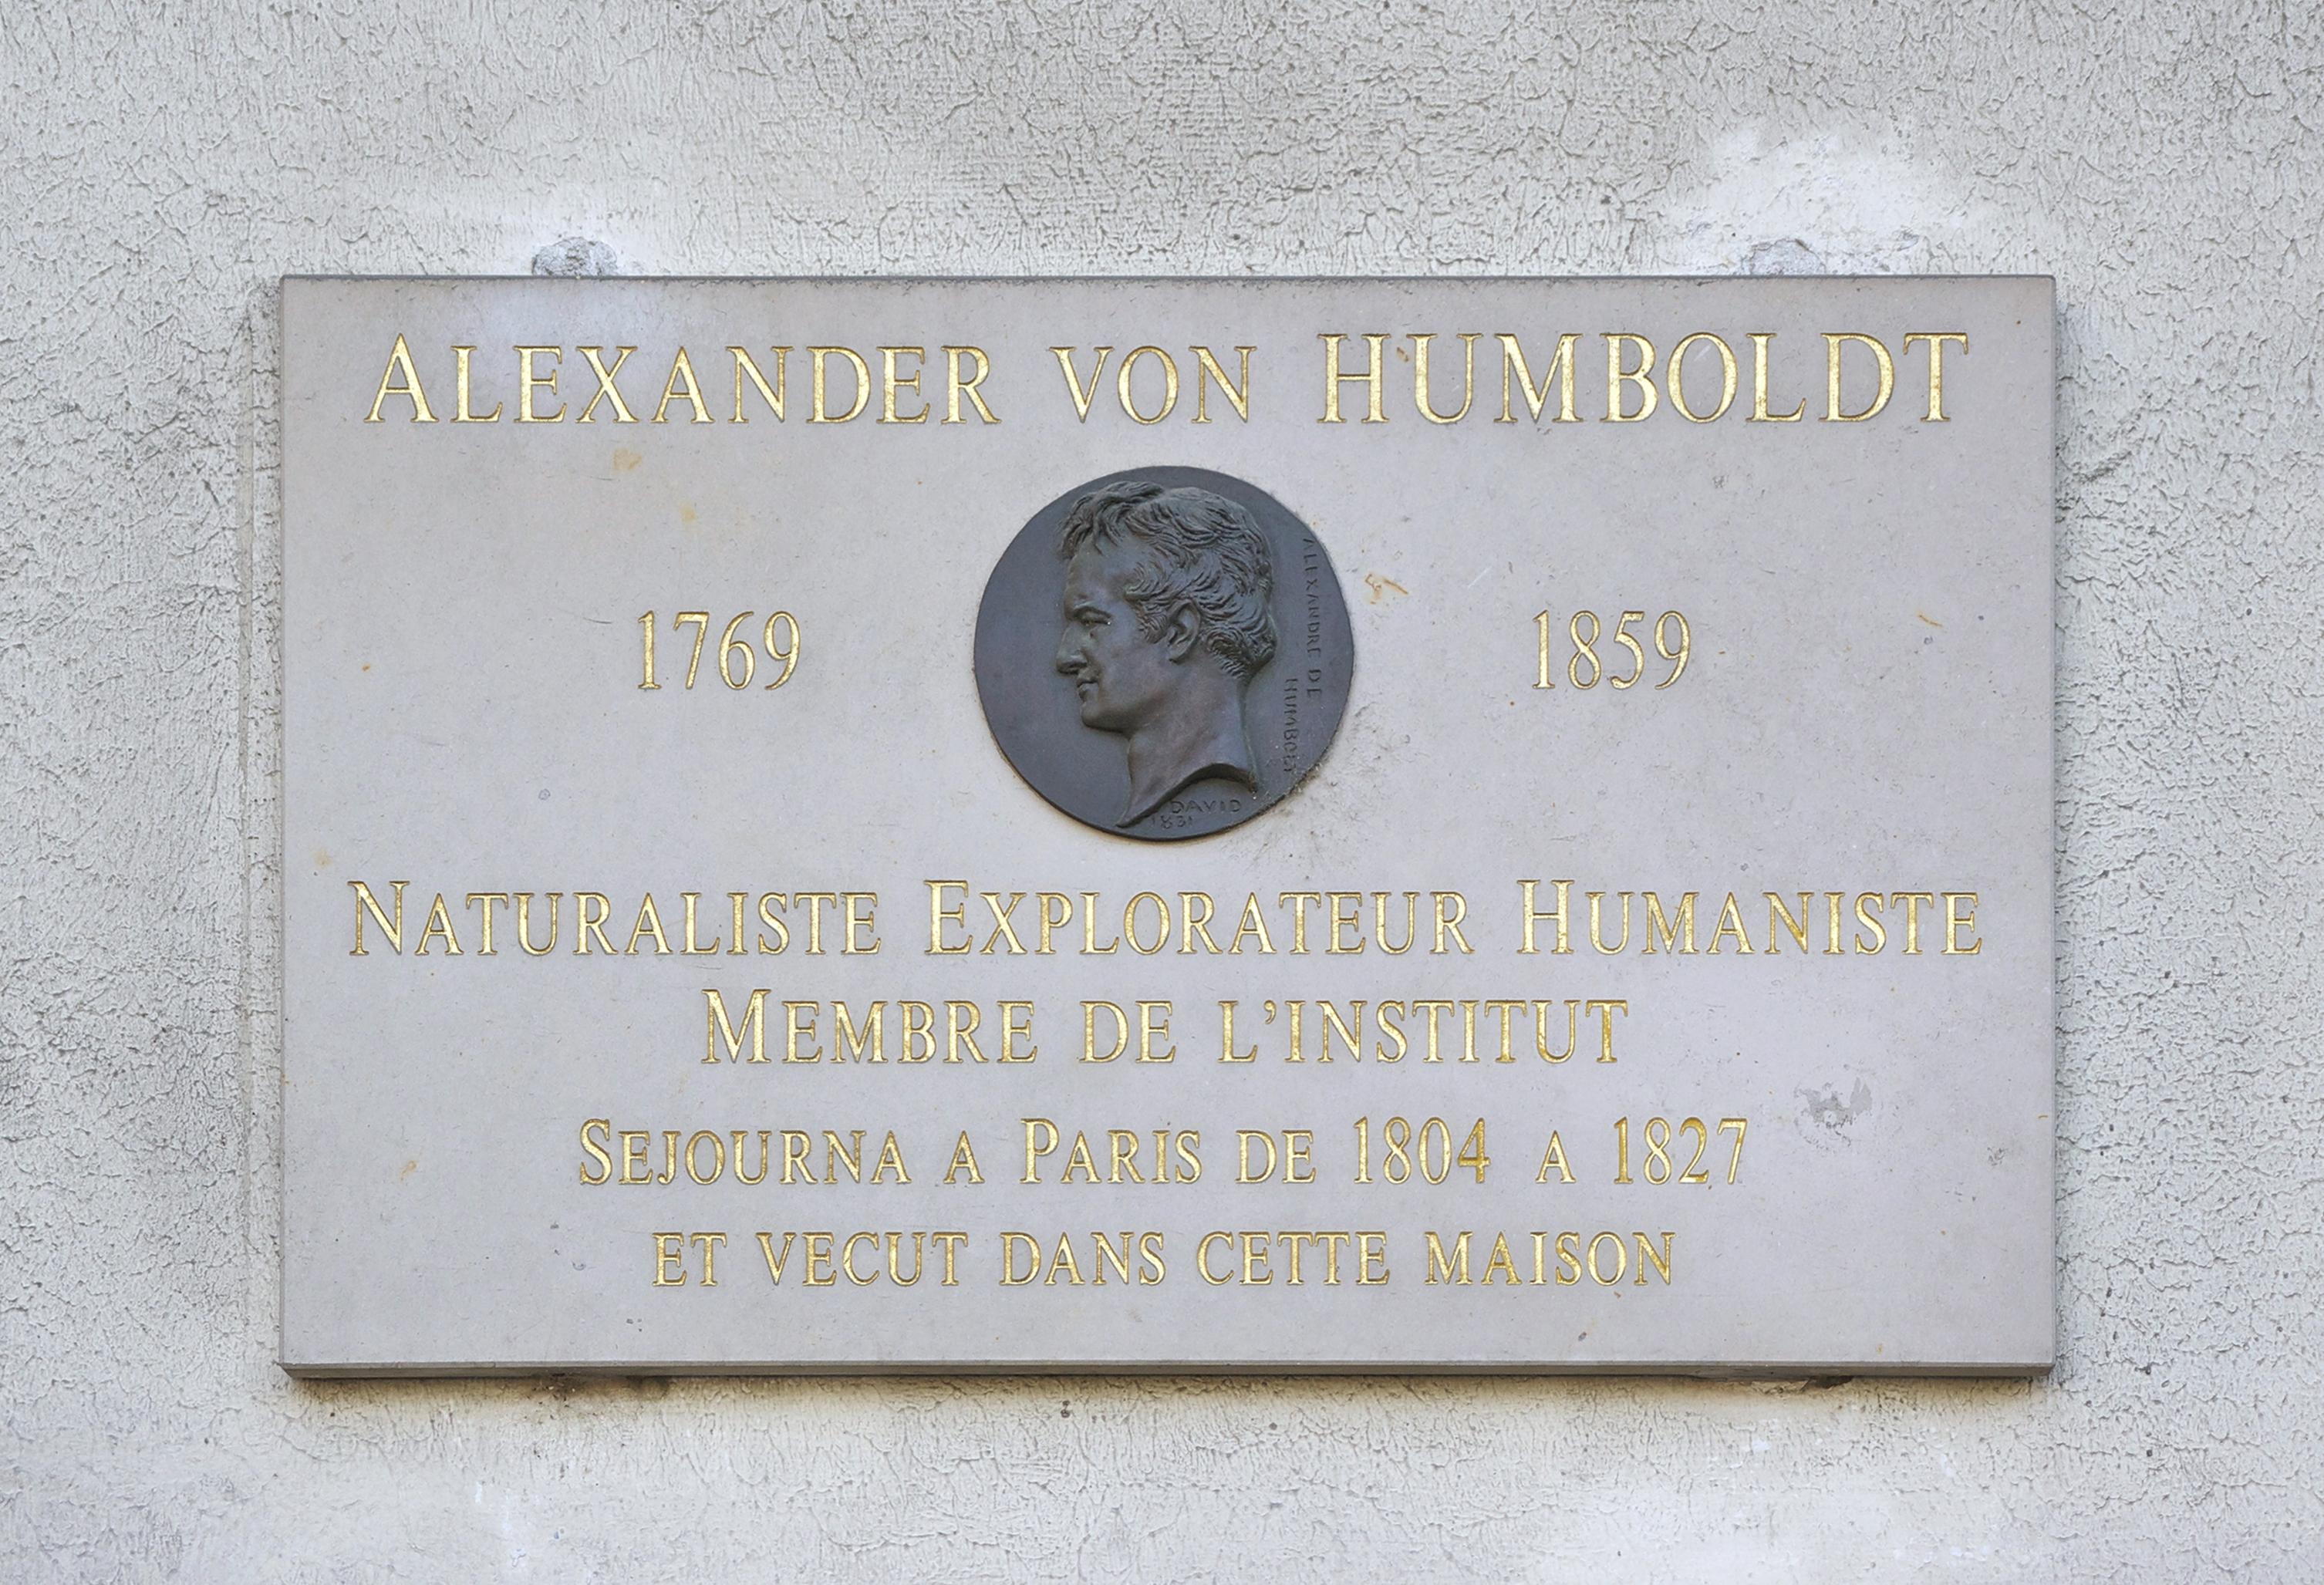 http://upload.wikimedia.org/wikipedia/commons/8/82/Plaque_Humboldt_Paris.jpg